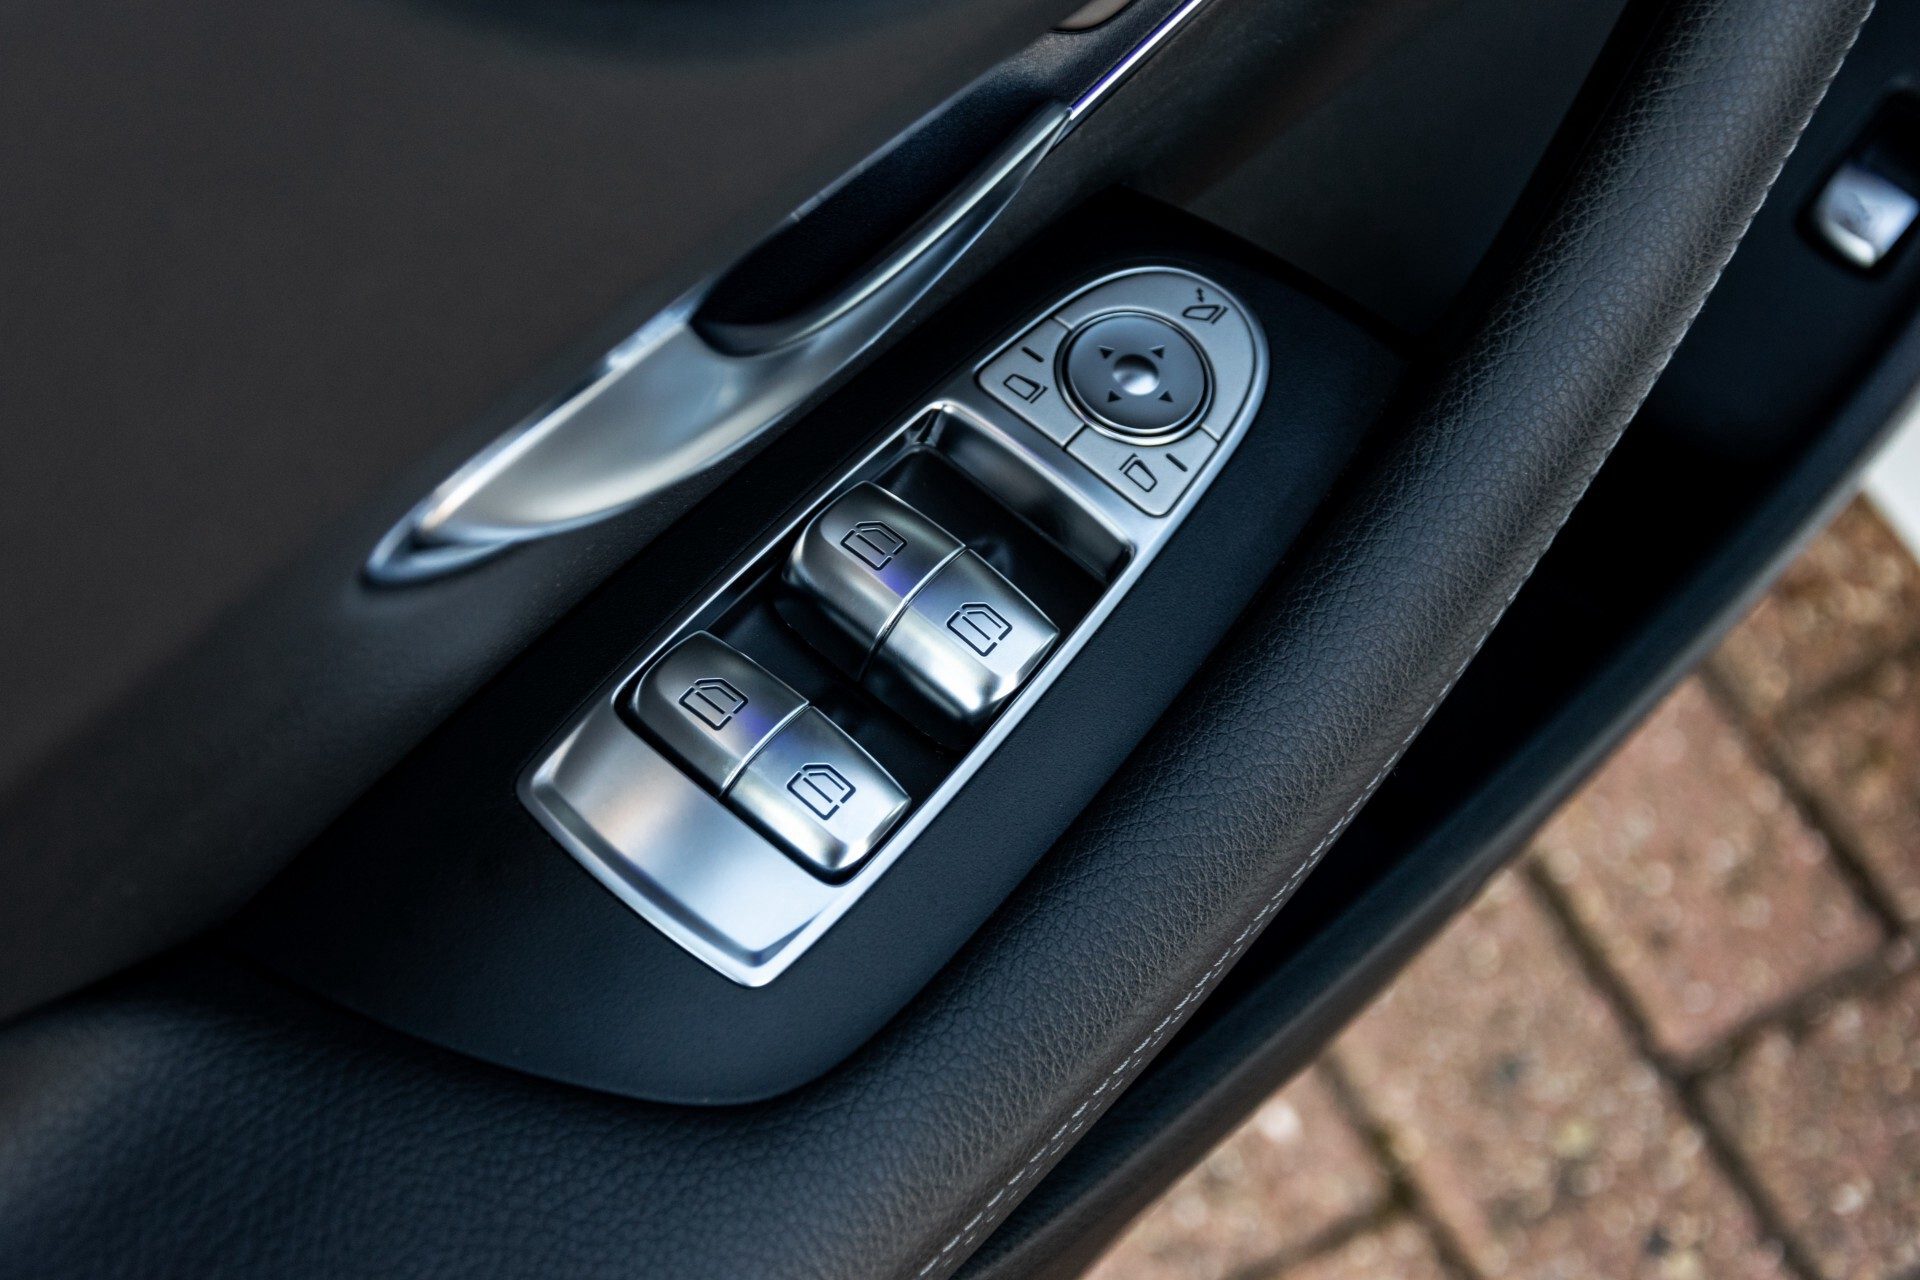 Mercedes-Benz E-Klasse Coupé 300 AMG Panorama/Rij-assist/Keyless/Massage/Memory/HUD/Standkachel/Night Aut9 Foto 32